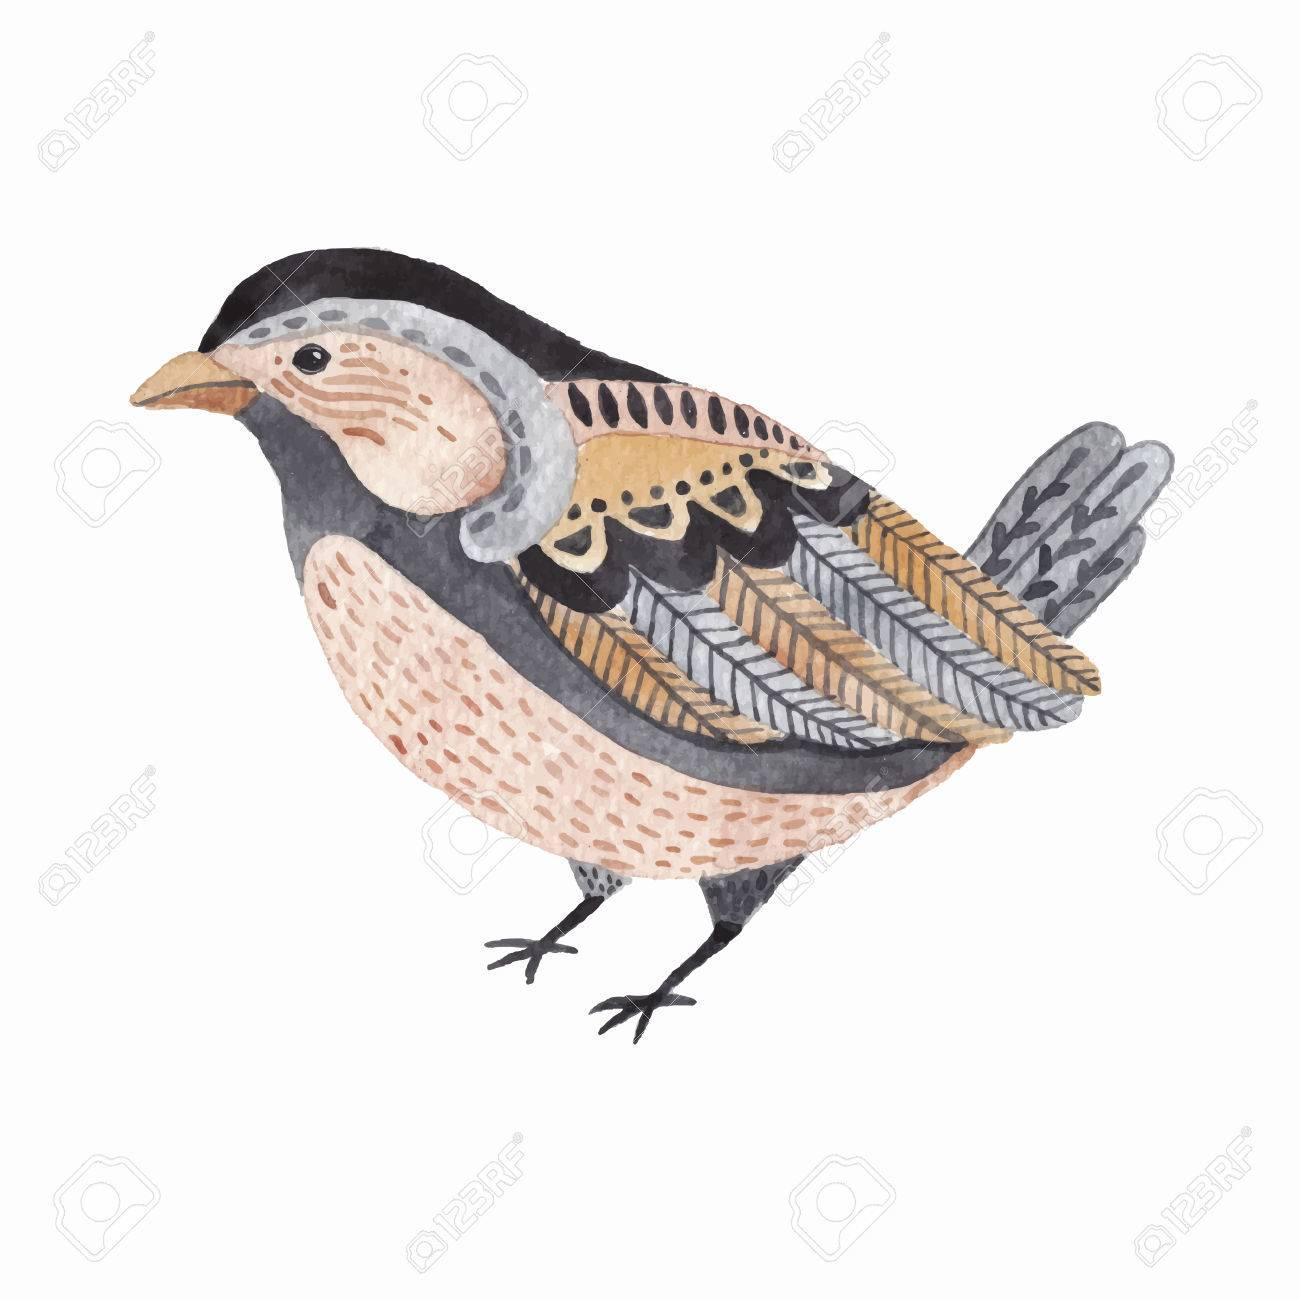 Watercolor Cute Little Bird Hand Drawn Watercolour Illustration